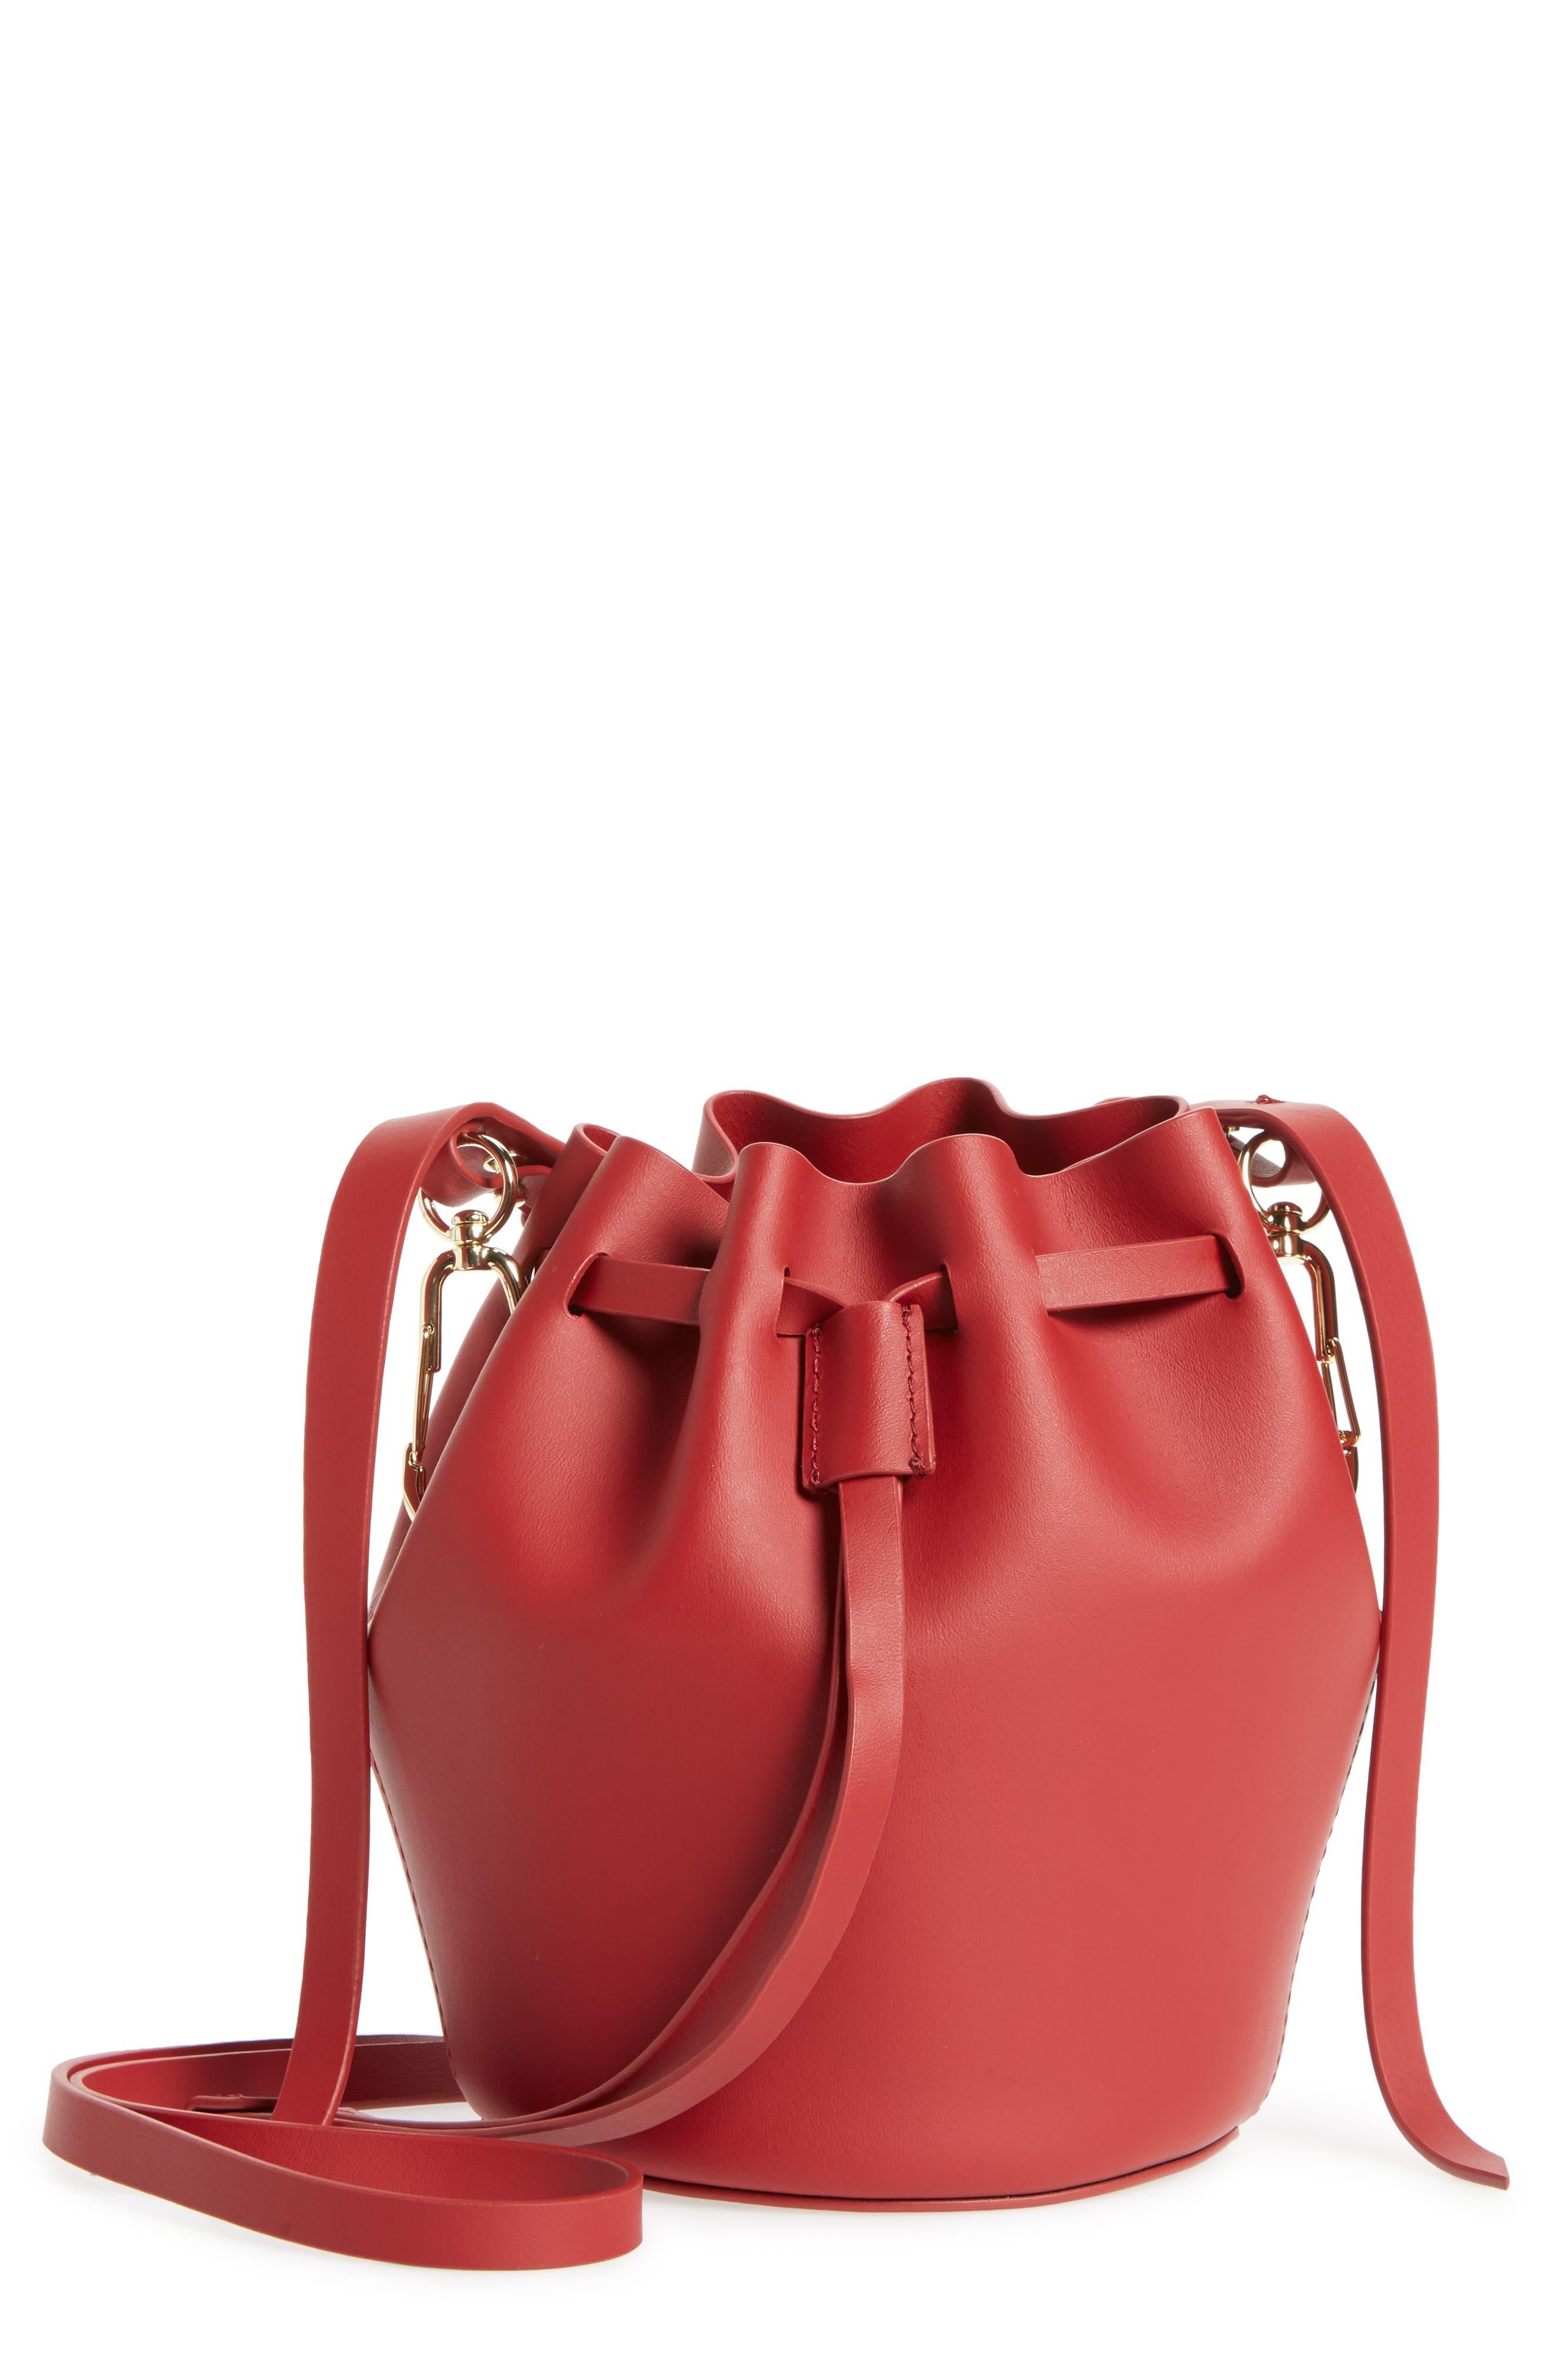 Alternate Image 1 Selected - ZAC Zac Posen Mini Belay Calfskin Leather Drawstring Bag